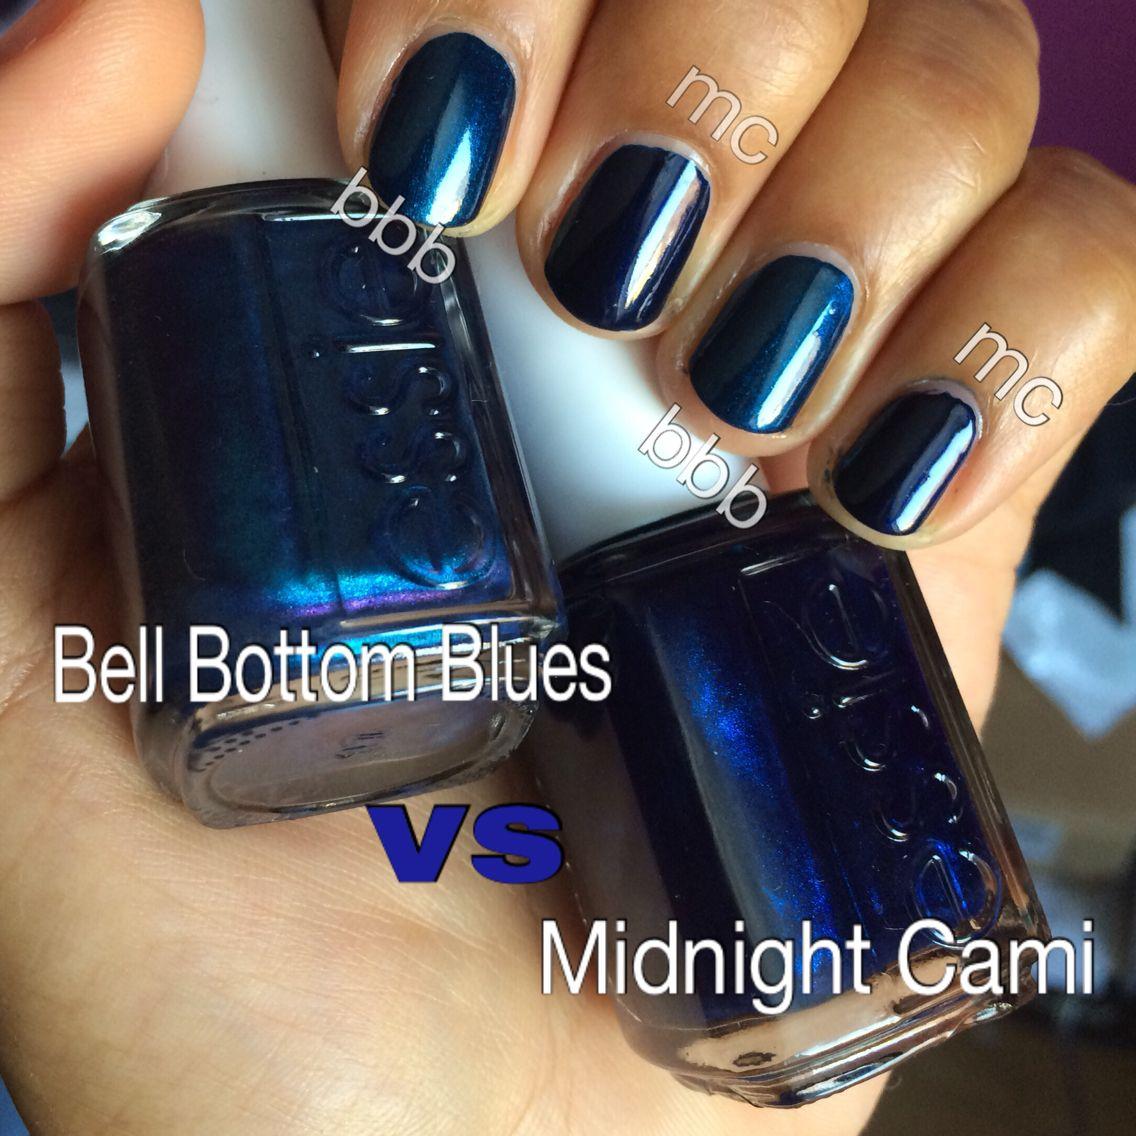 Essie Bell Bottom Blues vs Essie Midnight Cami | My Dupe Tests ...